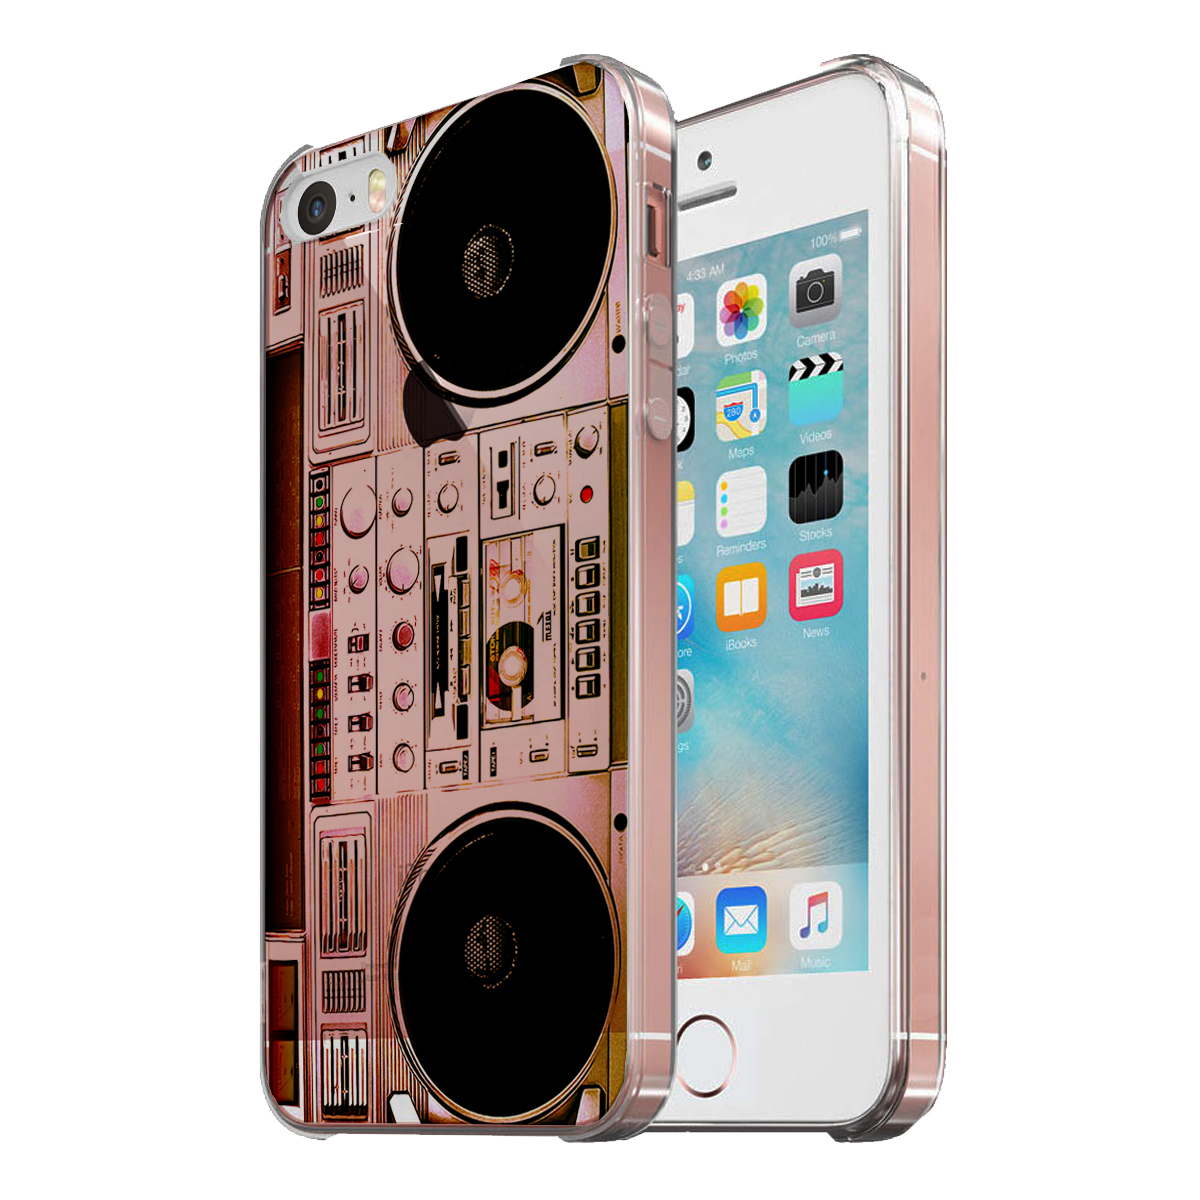 KuzmarK Clear Cover Case fits iPhone SE & iPhone 5 - Boombox Ghettoblaster Radio